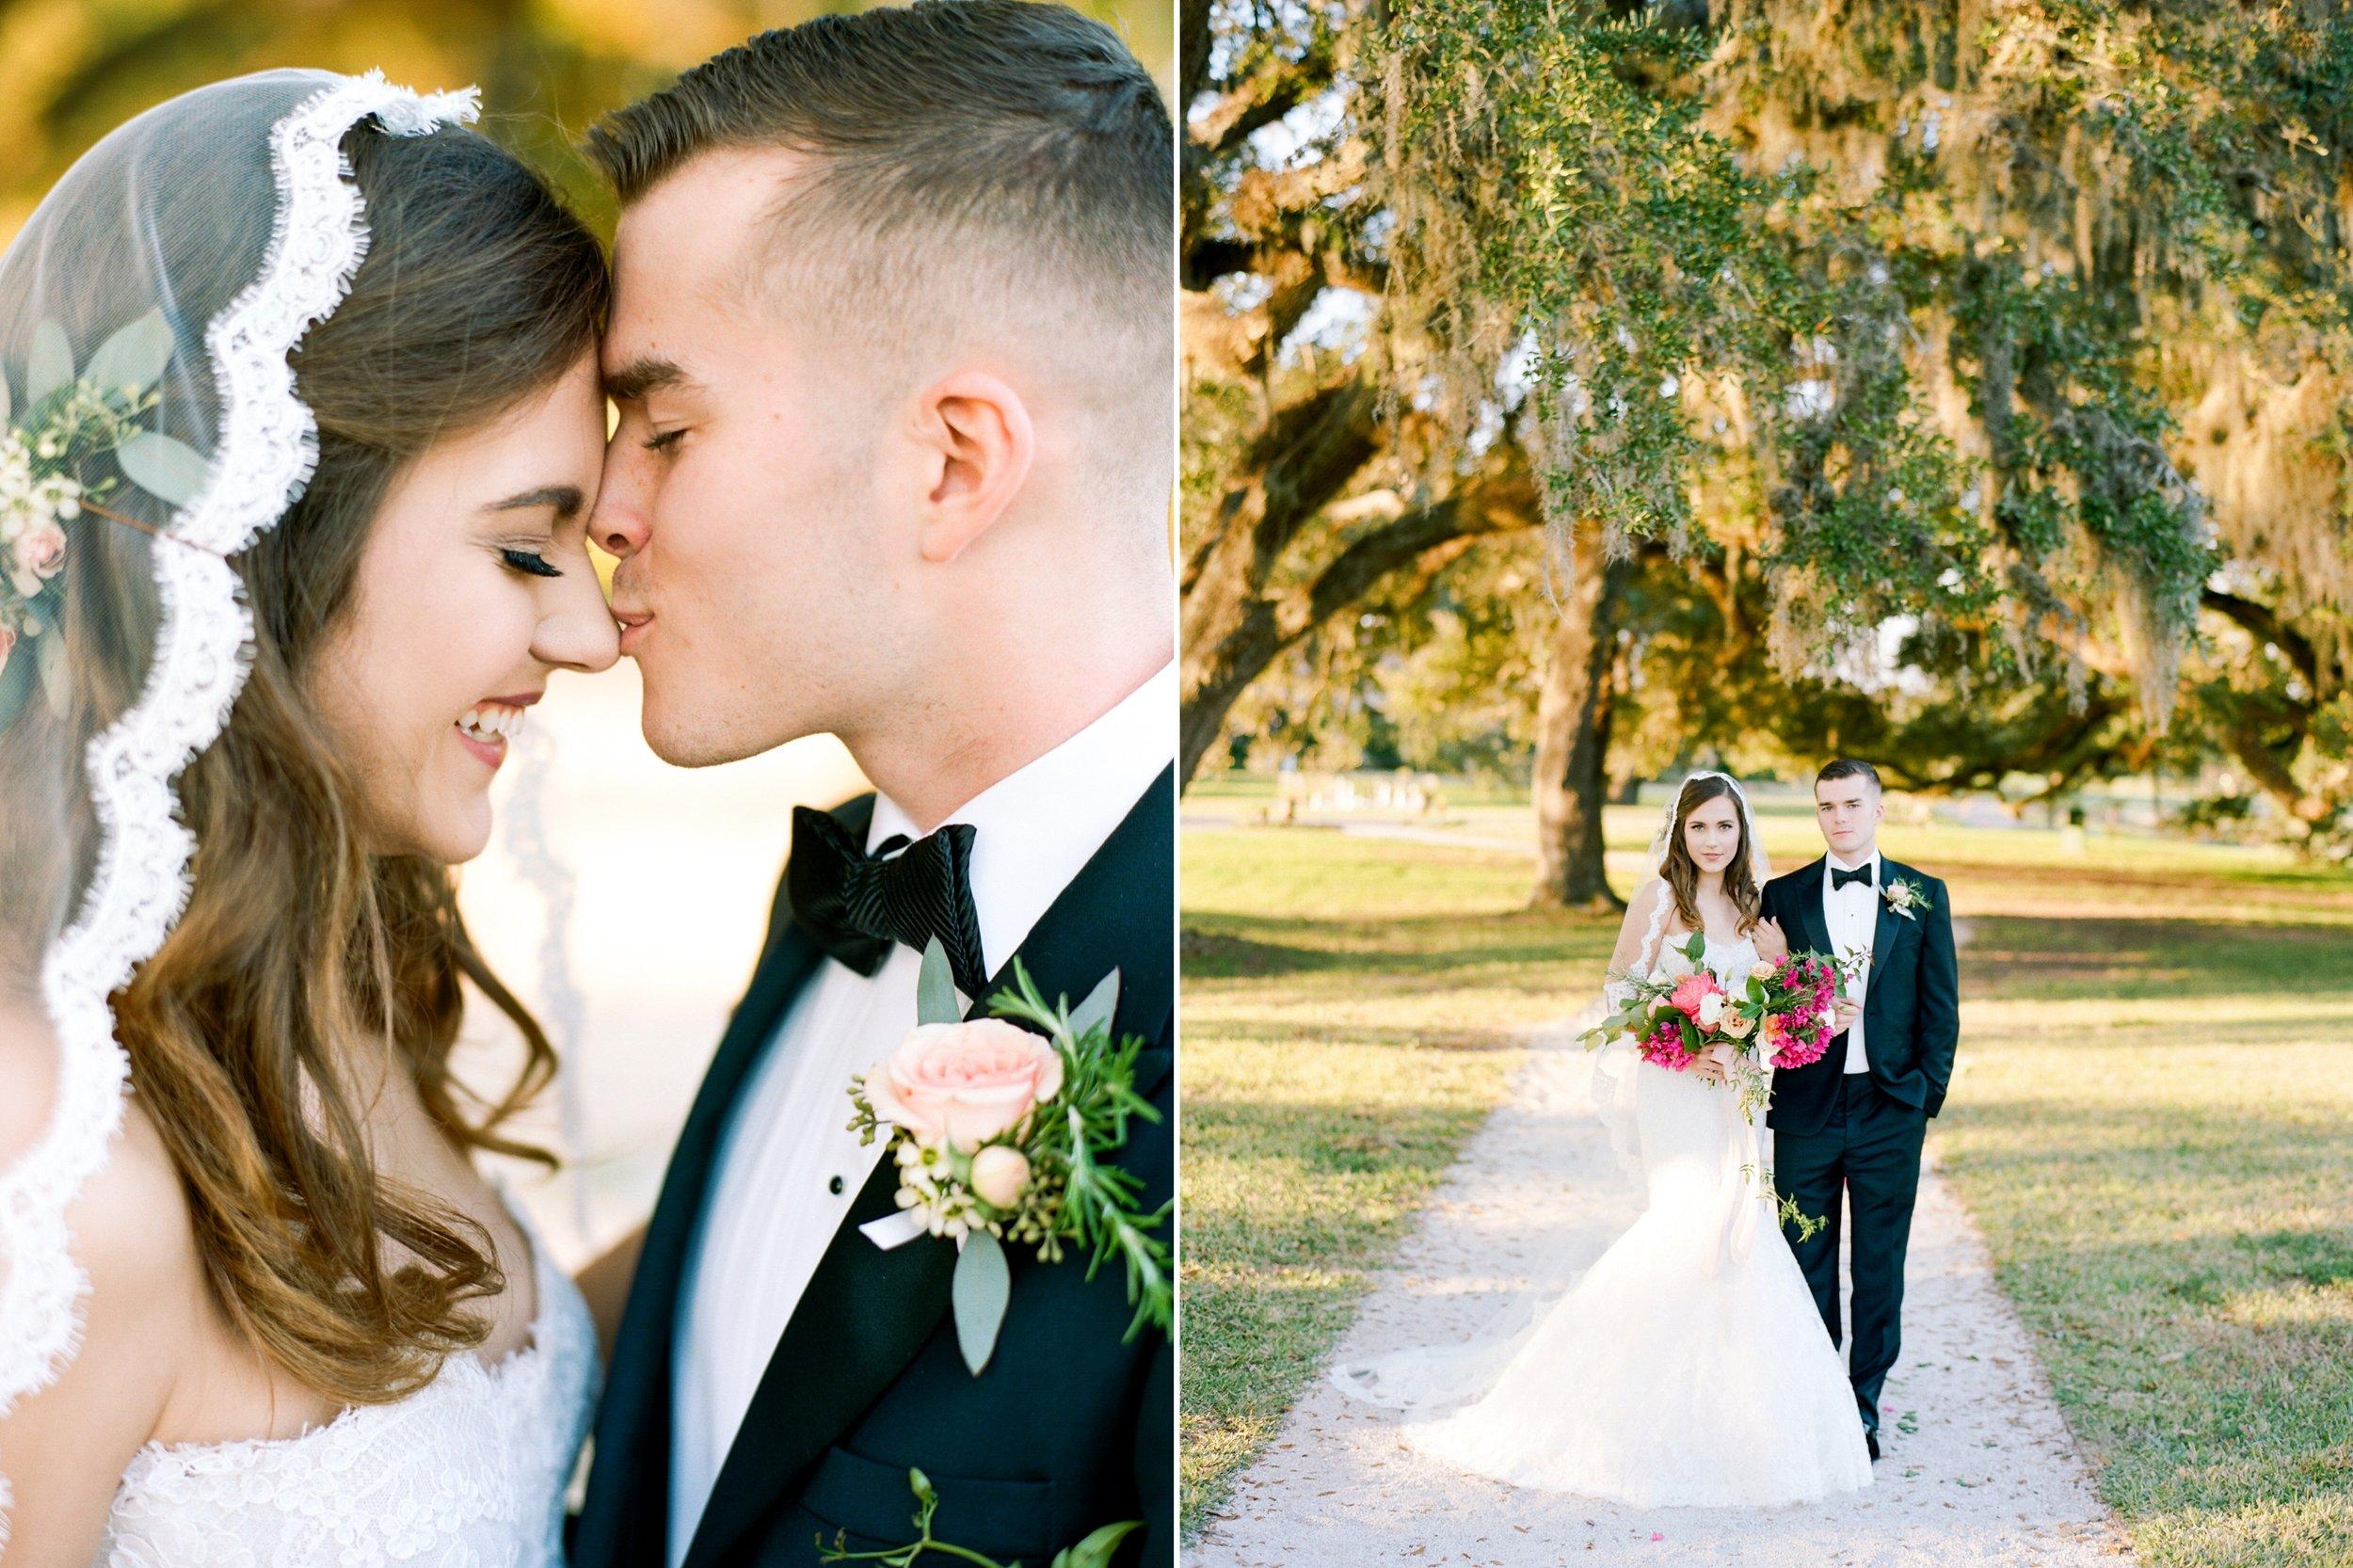 the-clubs-at-houston-oaks-wedding-houston-oaks-wedding-ceremony-houston-oaks-chapel-belle-of-the-ball-dana-fernandez-photography-houston-wedding-photographer-luxury-film-fine-art-116.jpg